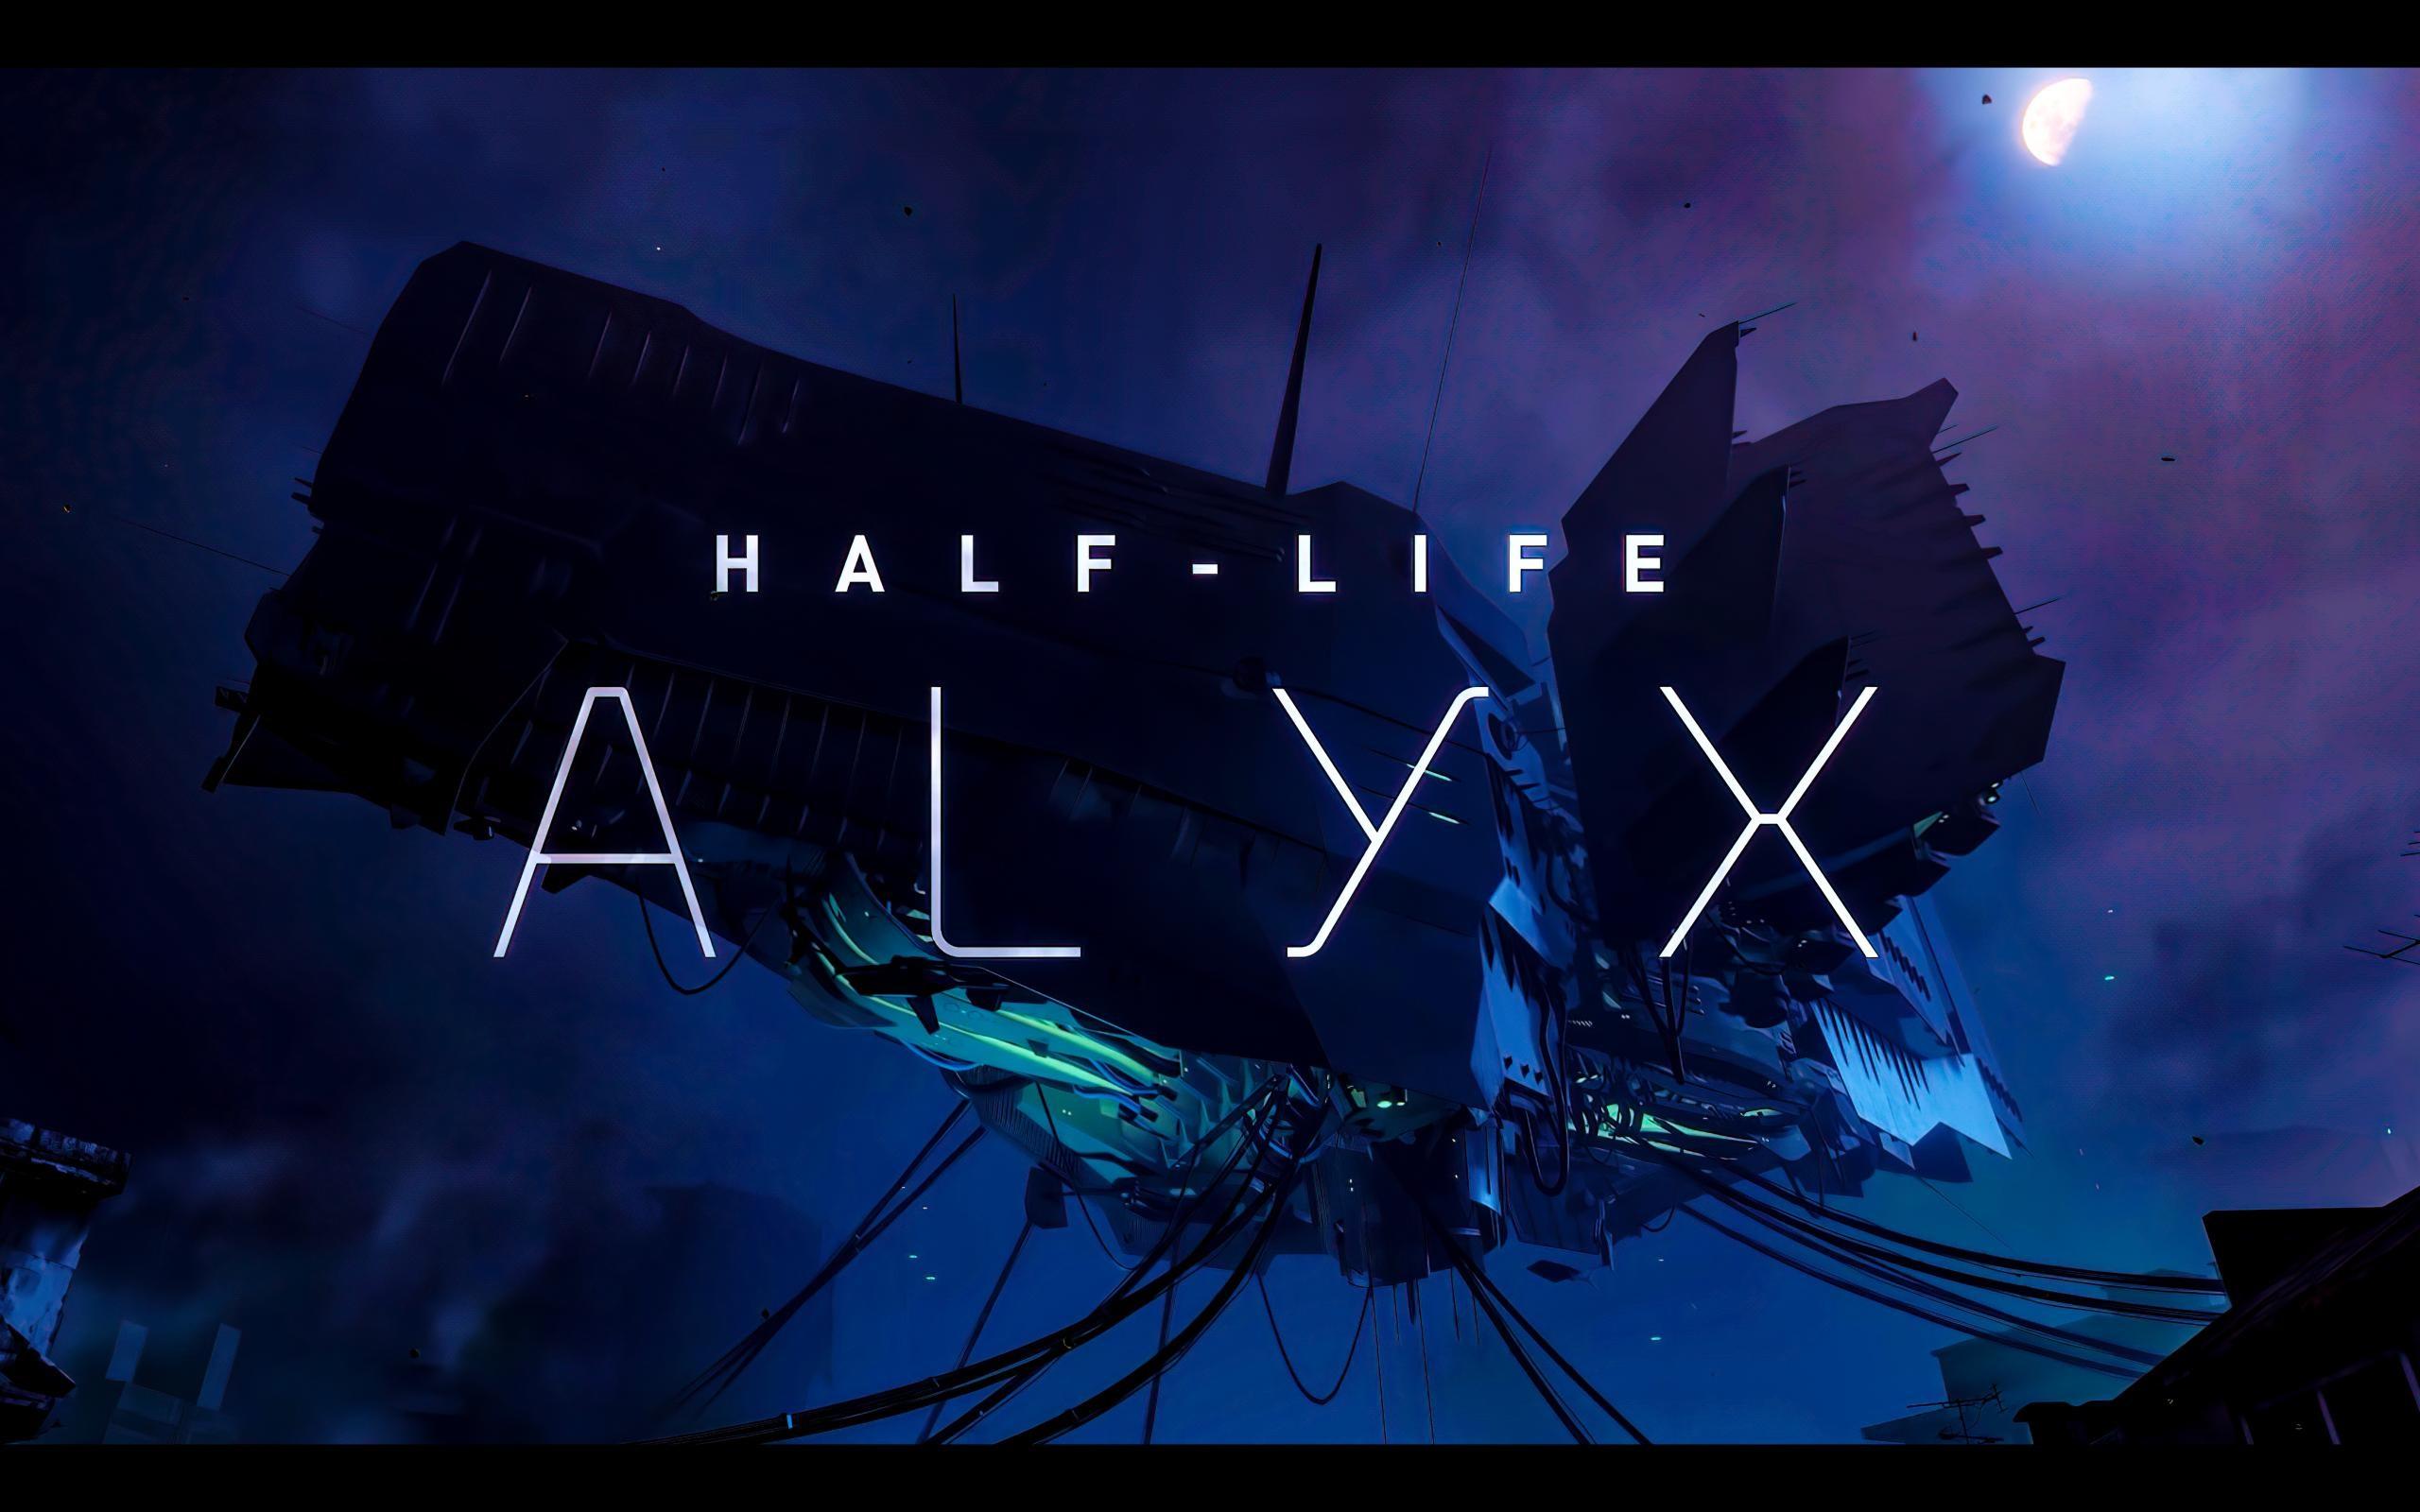 half life alyx 23 mart